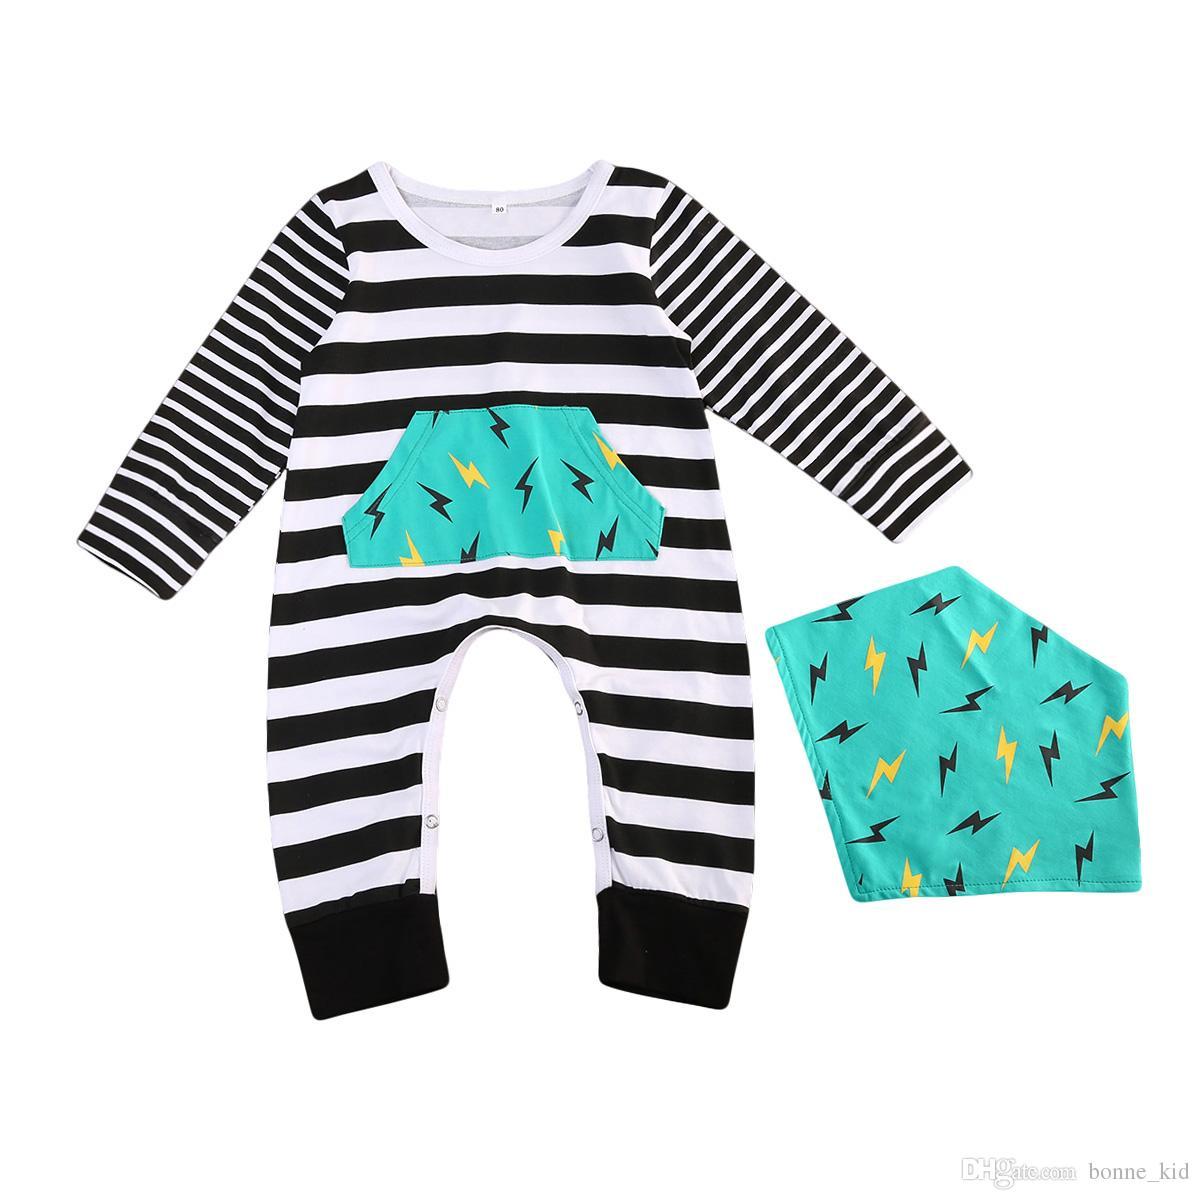 3d3fd9b265c7 2019 Baby Boy Striped Romper Long Sleeve Jumpsuit Bib Set Geometric Flash  Baby Clothes Outfits Kids Boys Girls Rompers Bodysuit 0 24M From Bonne kid